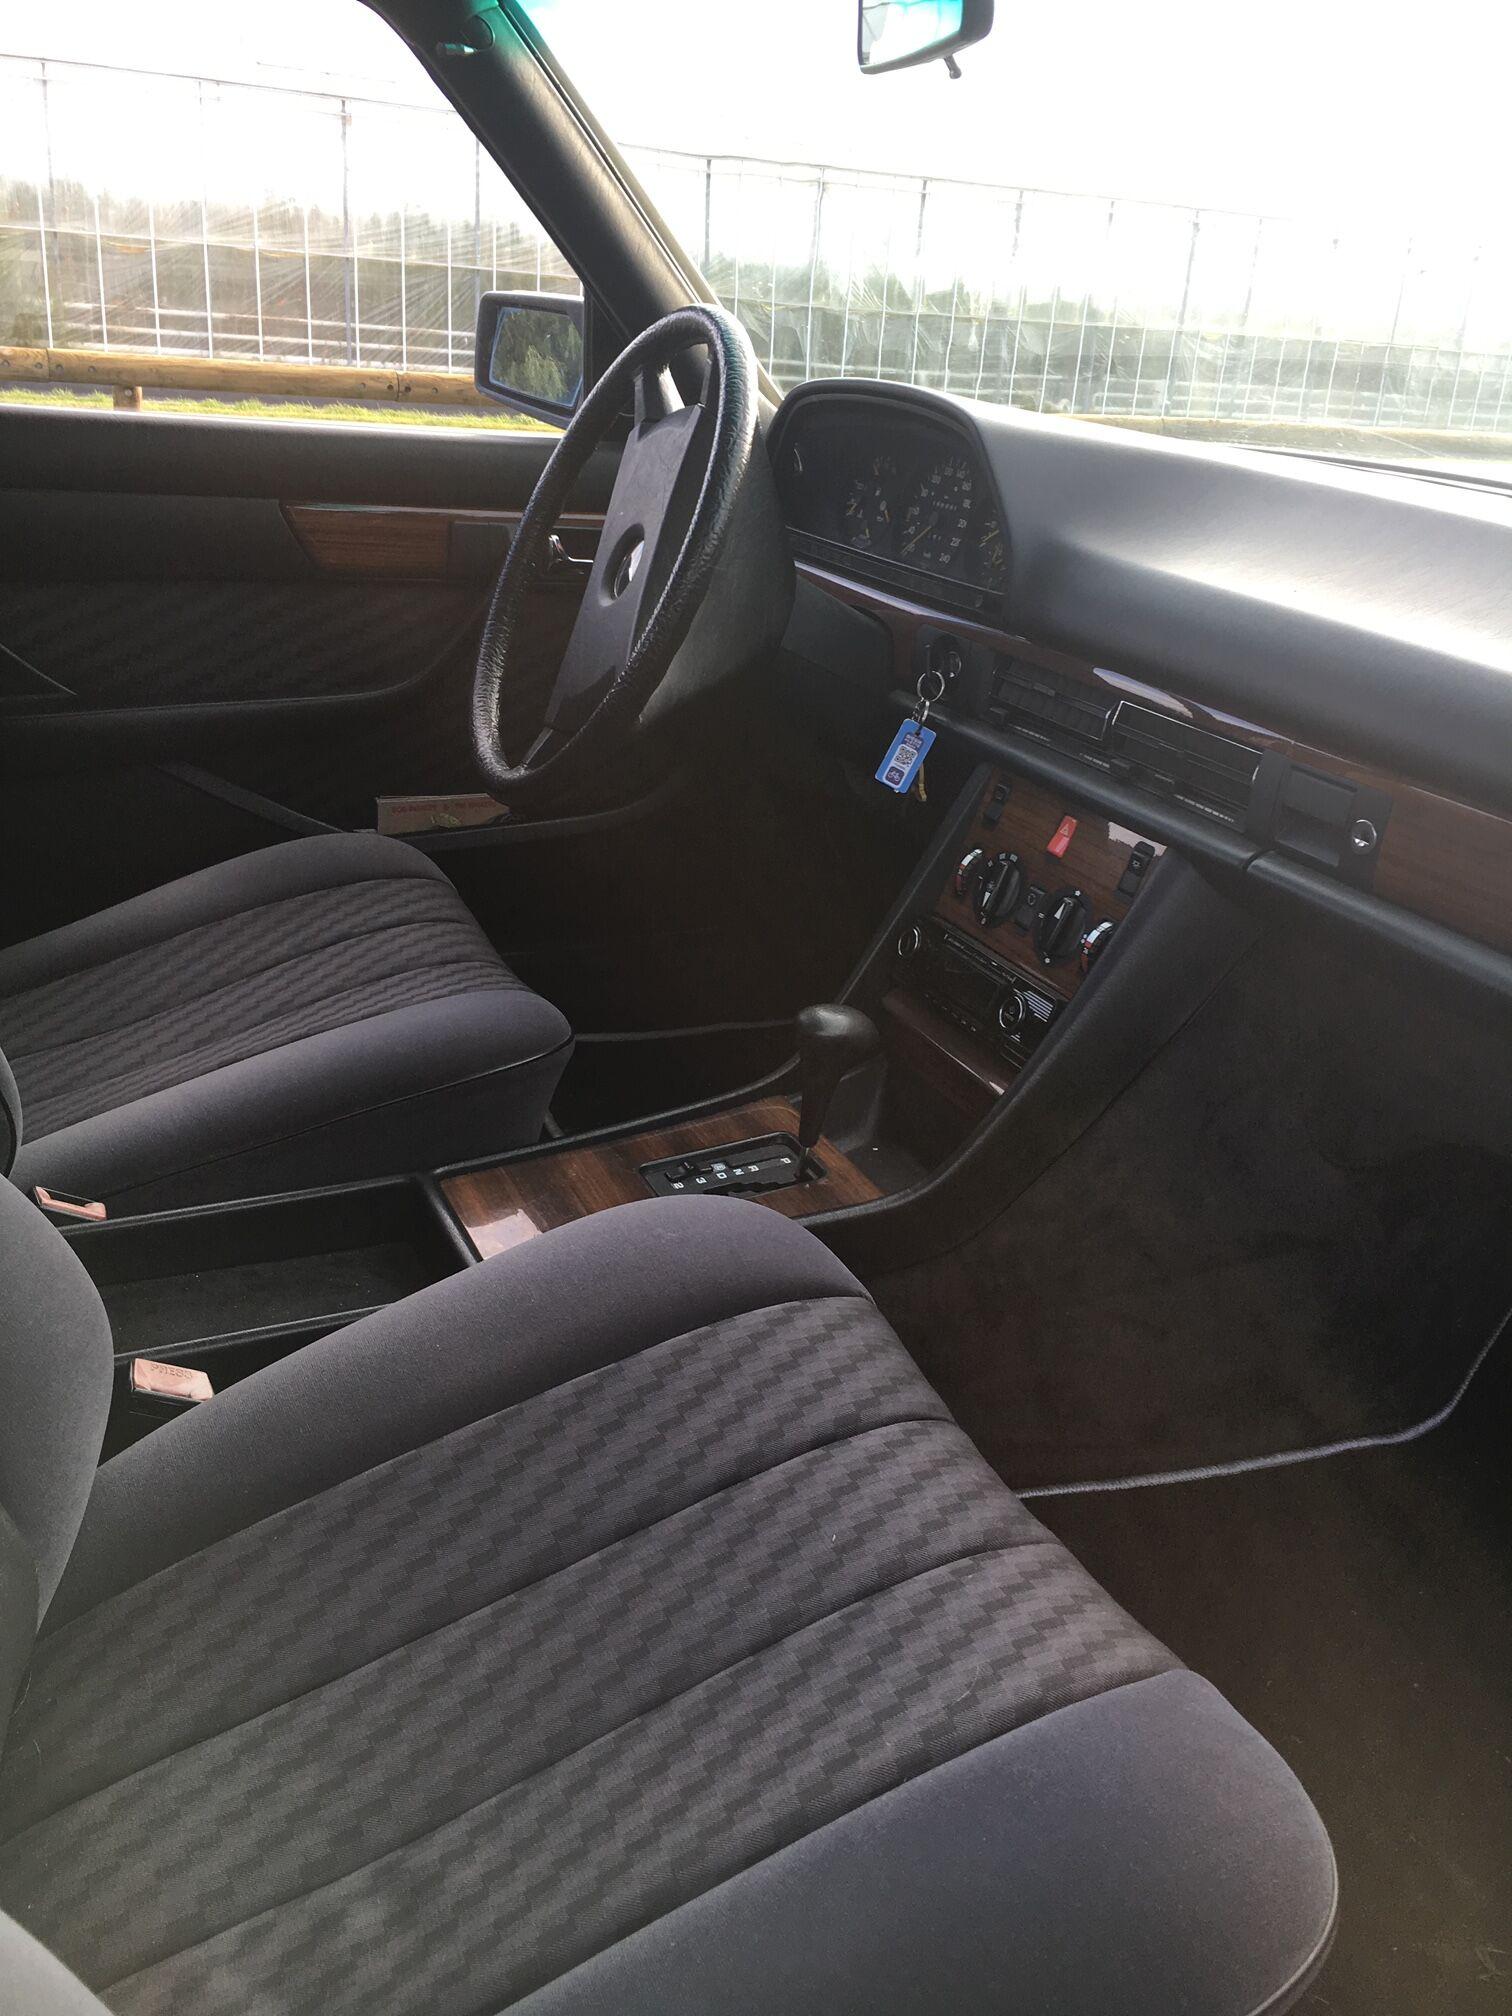 Mercedes 500 11/11